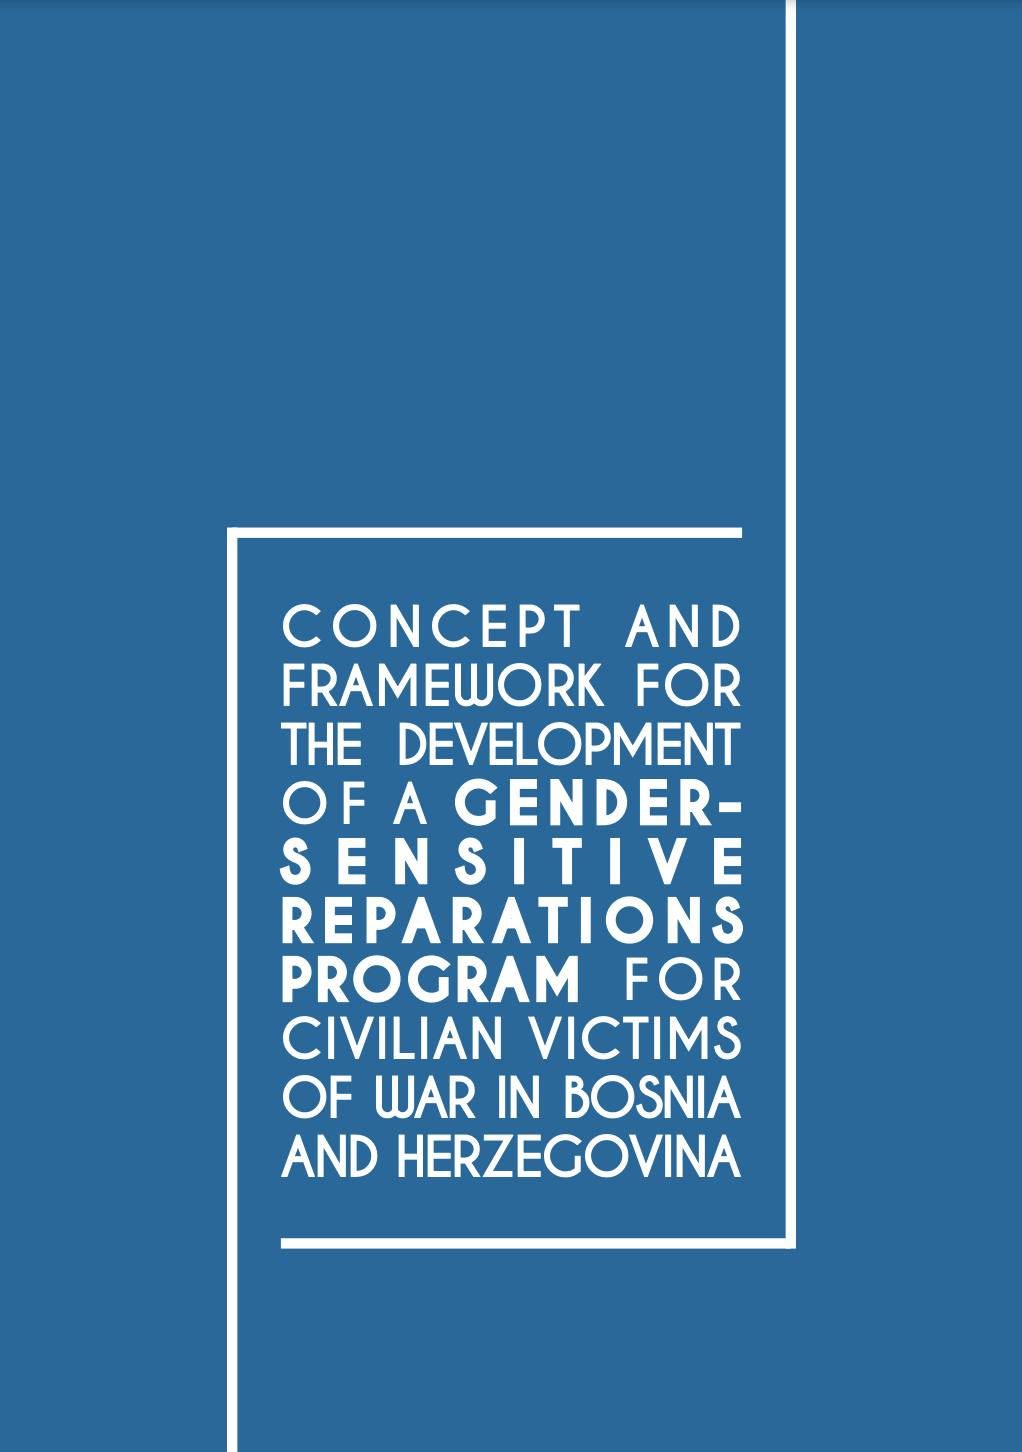 WILPF's publication on the development of gender-sensitive reparation program for civilian victims of war